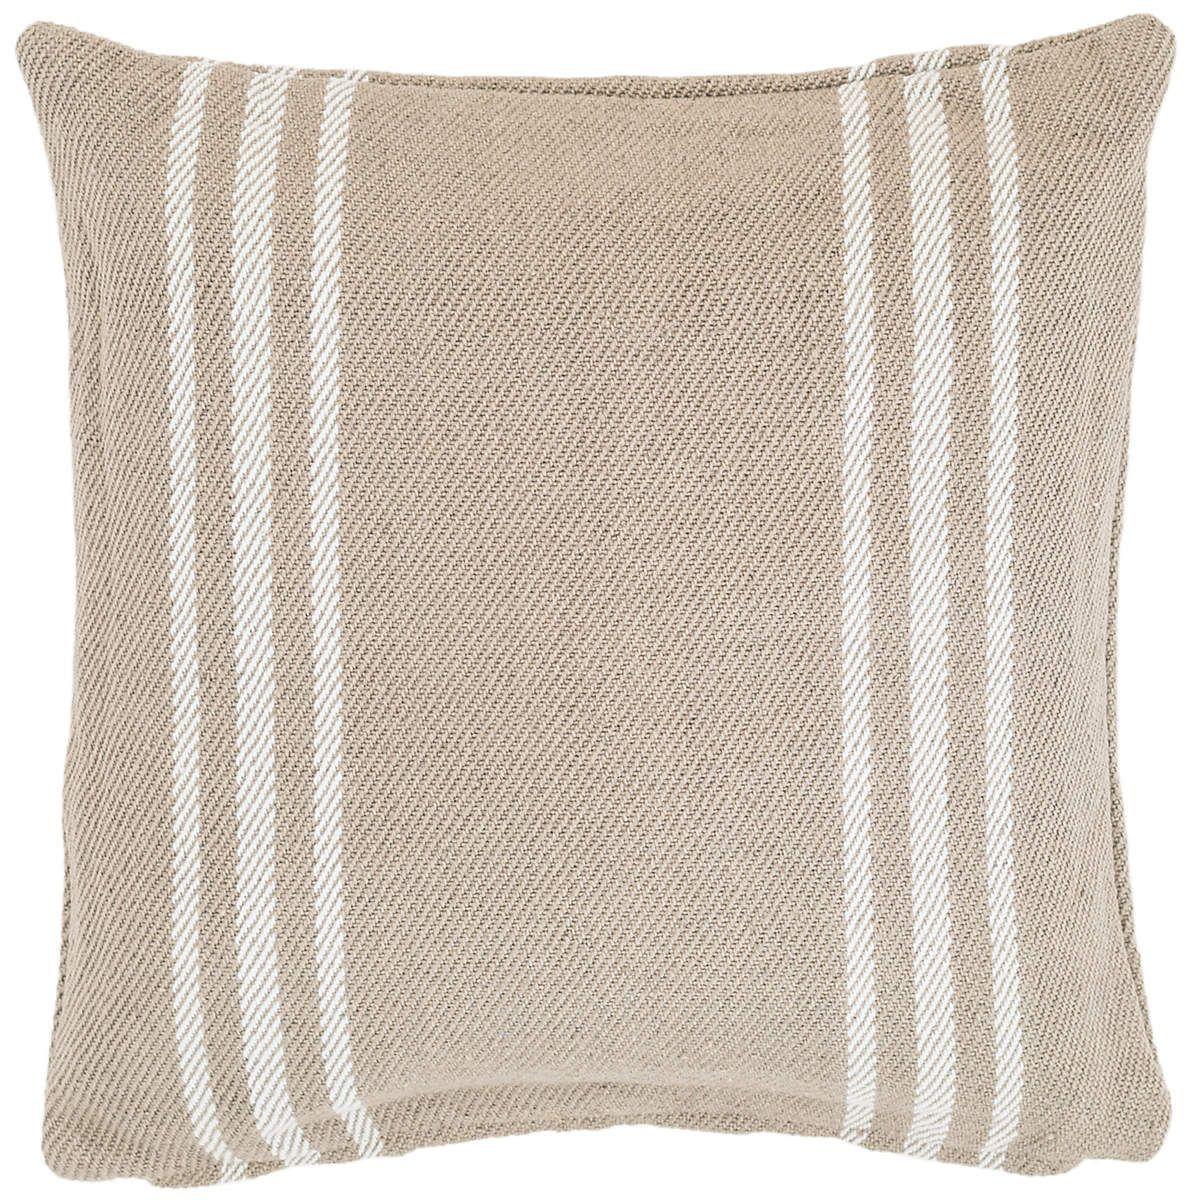 prodigious tips decorative pillows teal patterns decorative